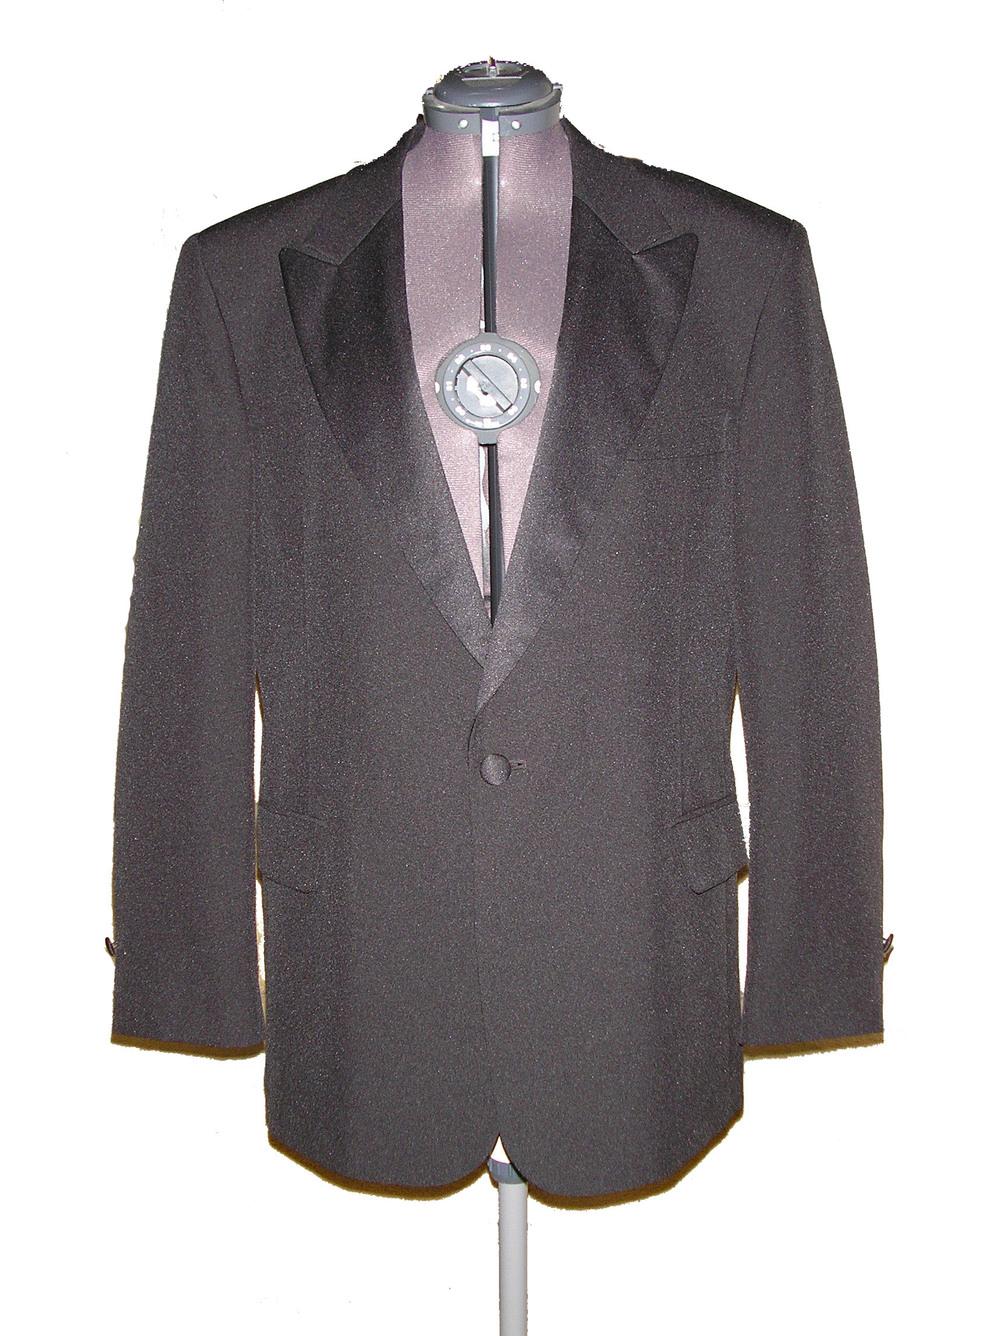 tobias-jacket1.jpg